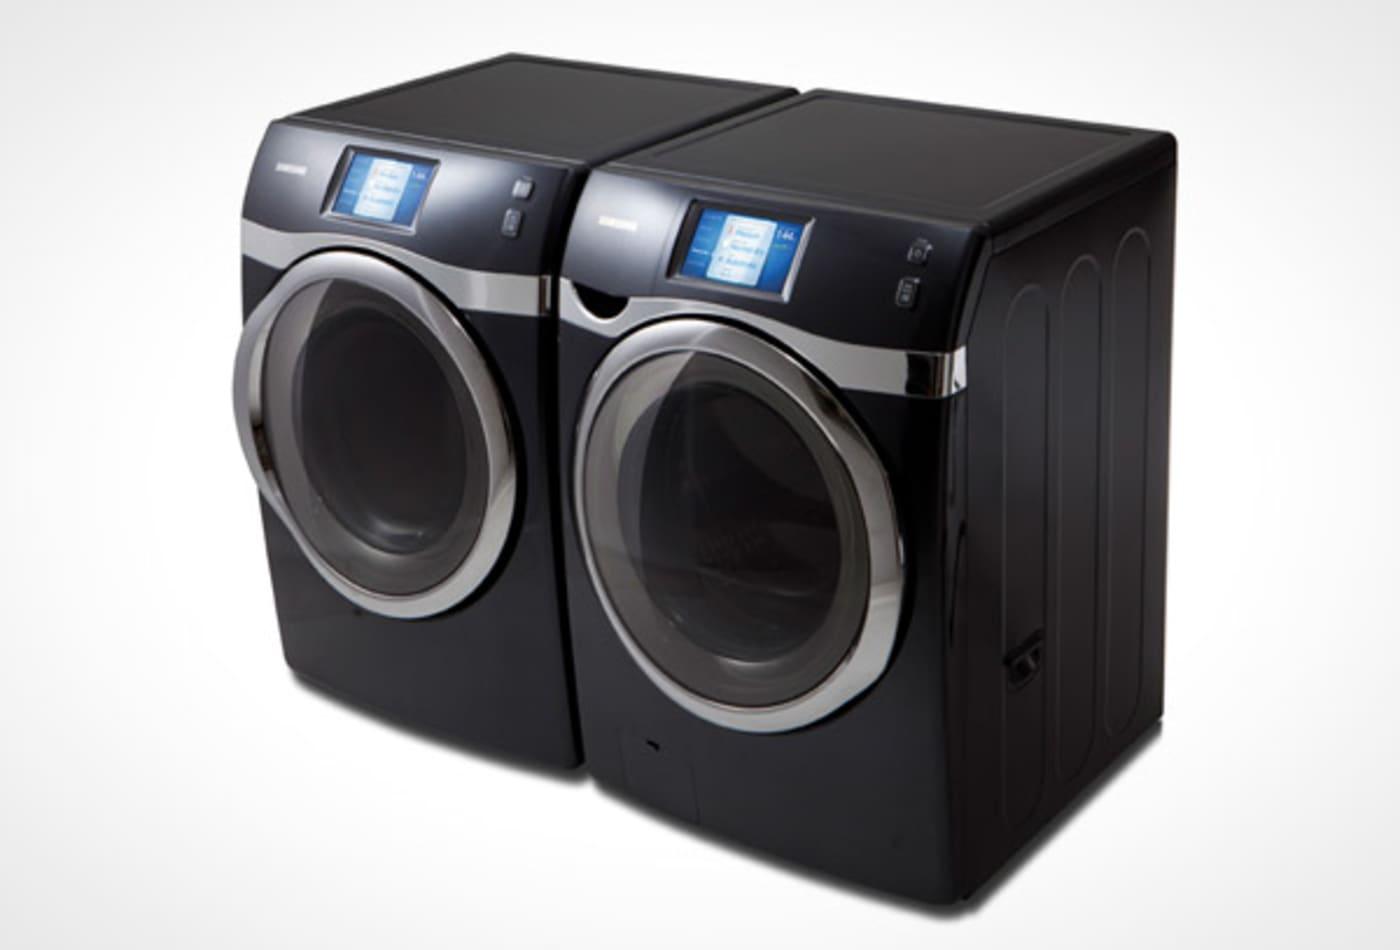 10-Smart-Dig-Appliances-01-Samsung-Wash-Dry.jpg